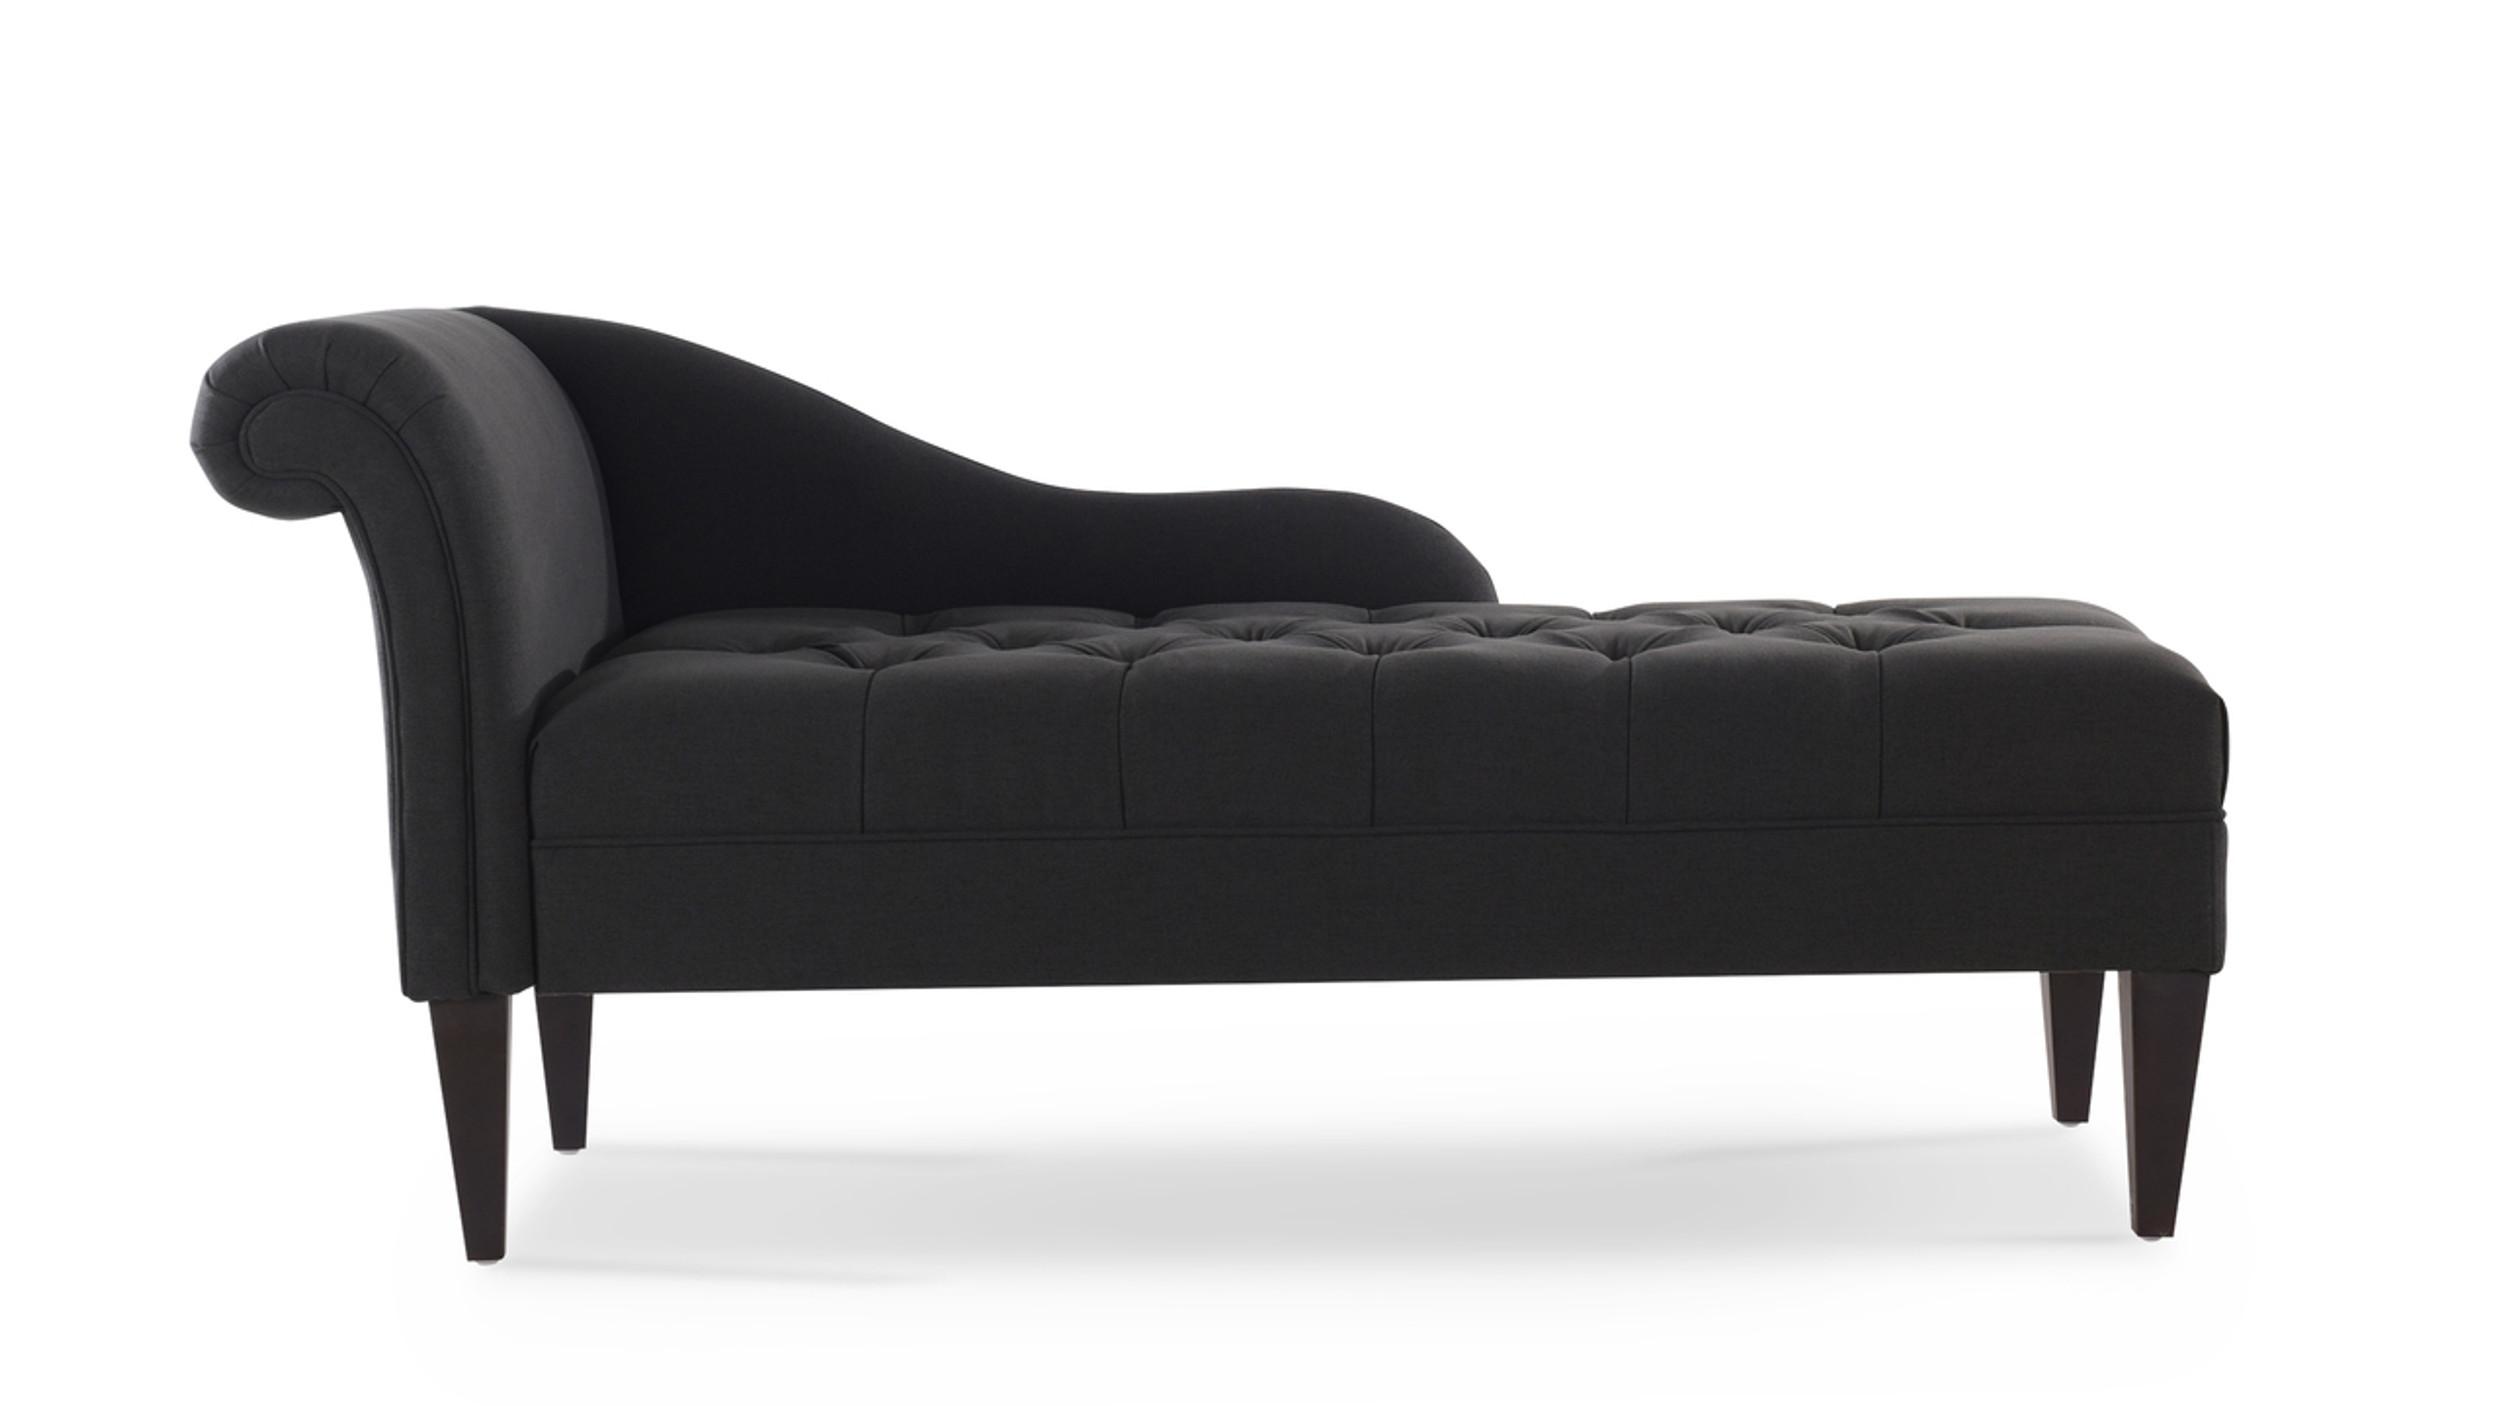 Harrison Tufted Chaise Lounge Jet Black Jennifer Taylor Home